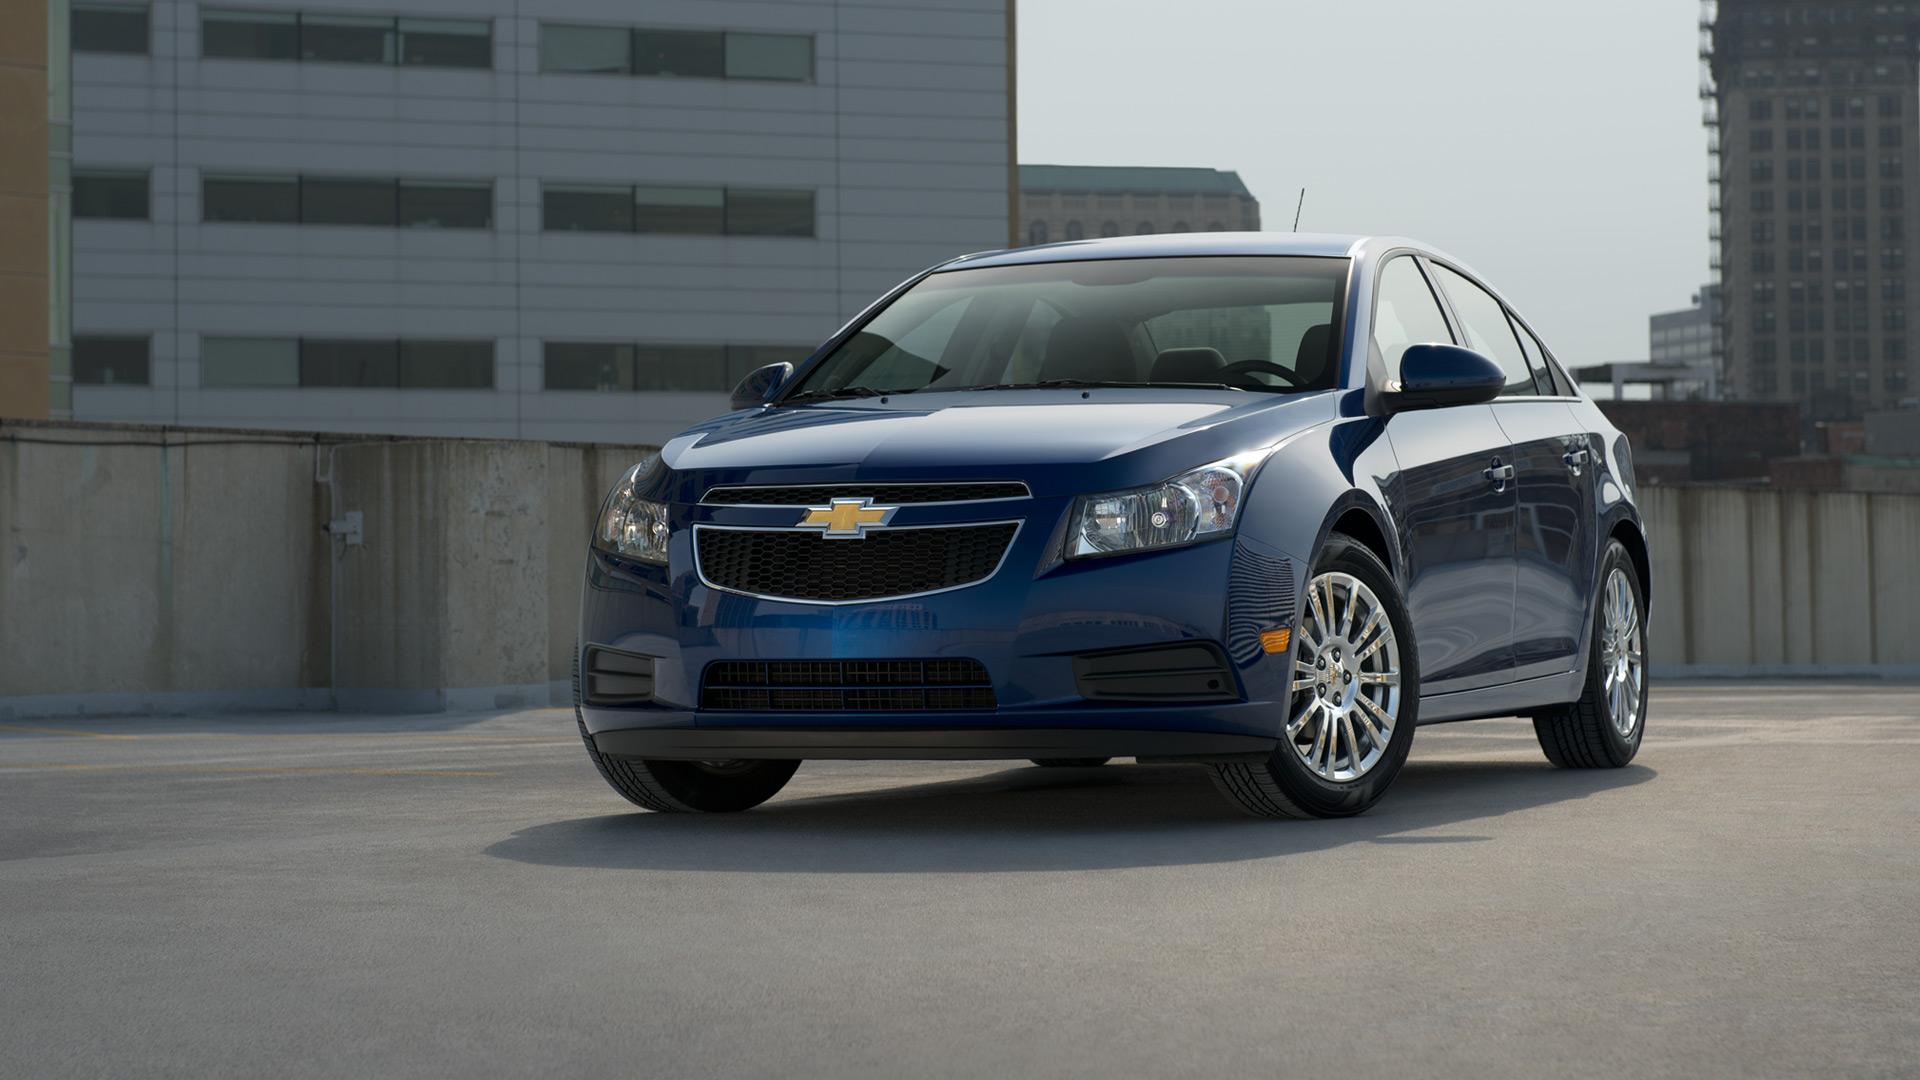 General Motors Chevrolet Cruze